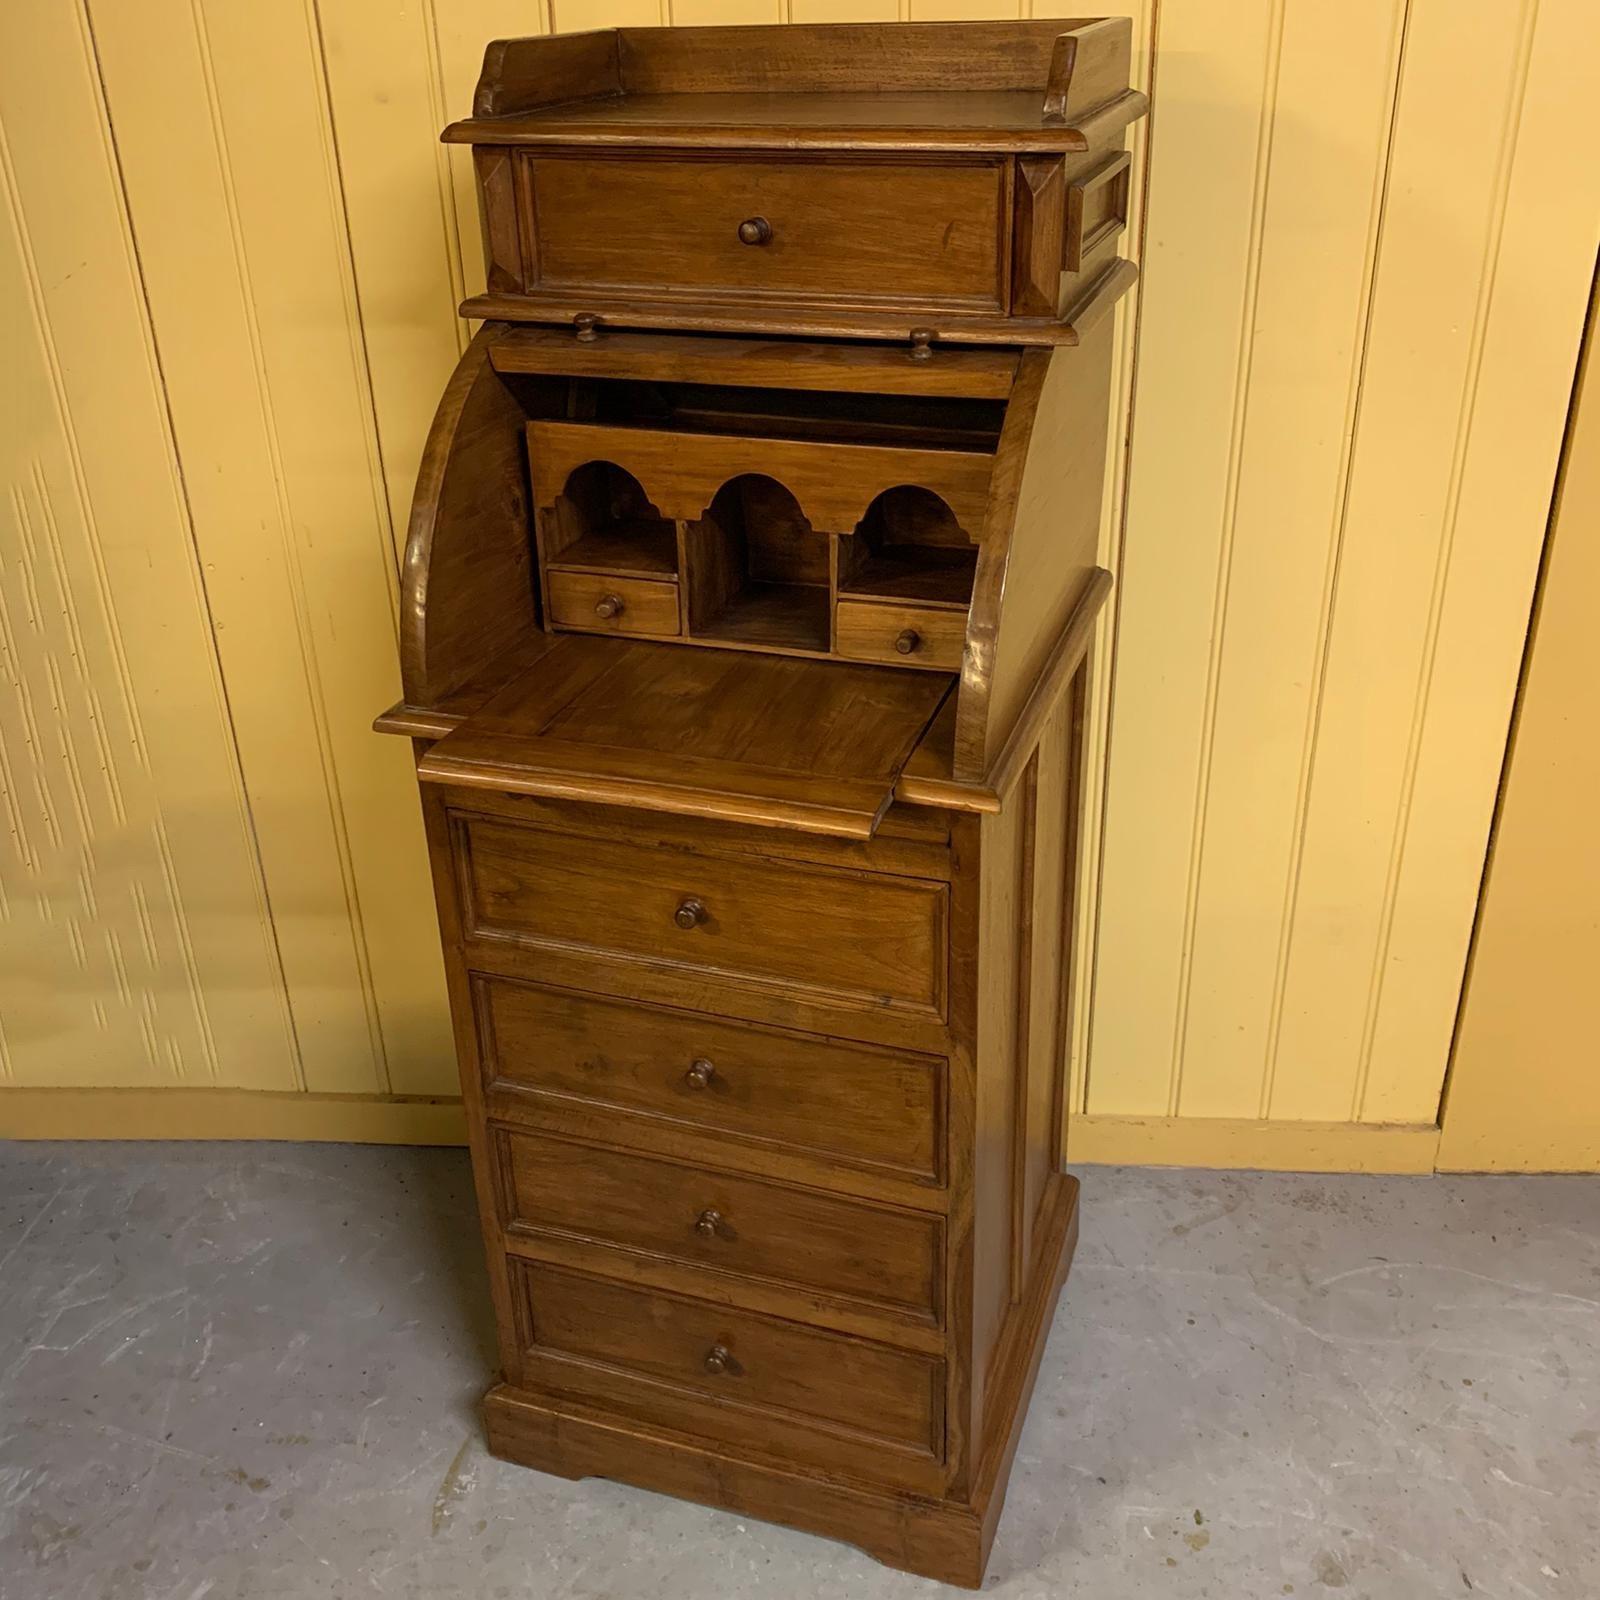 teak-hout-bureau-koloniaal-secretaire-jan-best-aalmeer-meubelen